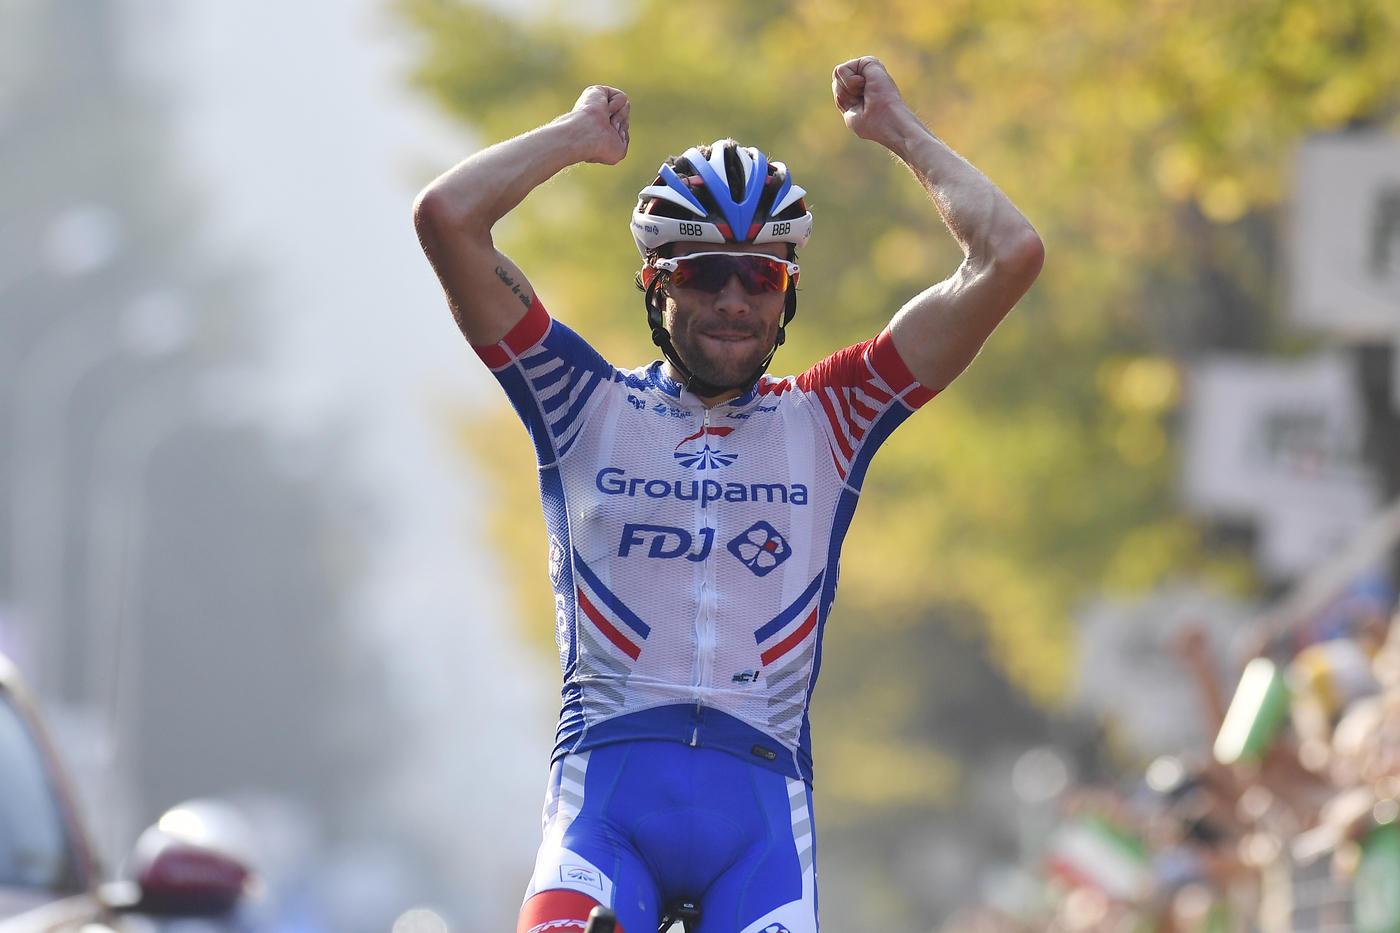 Pinot vince il Giro di Lombardia, battuto Nibali